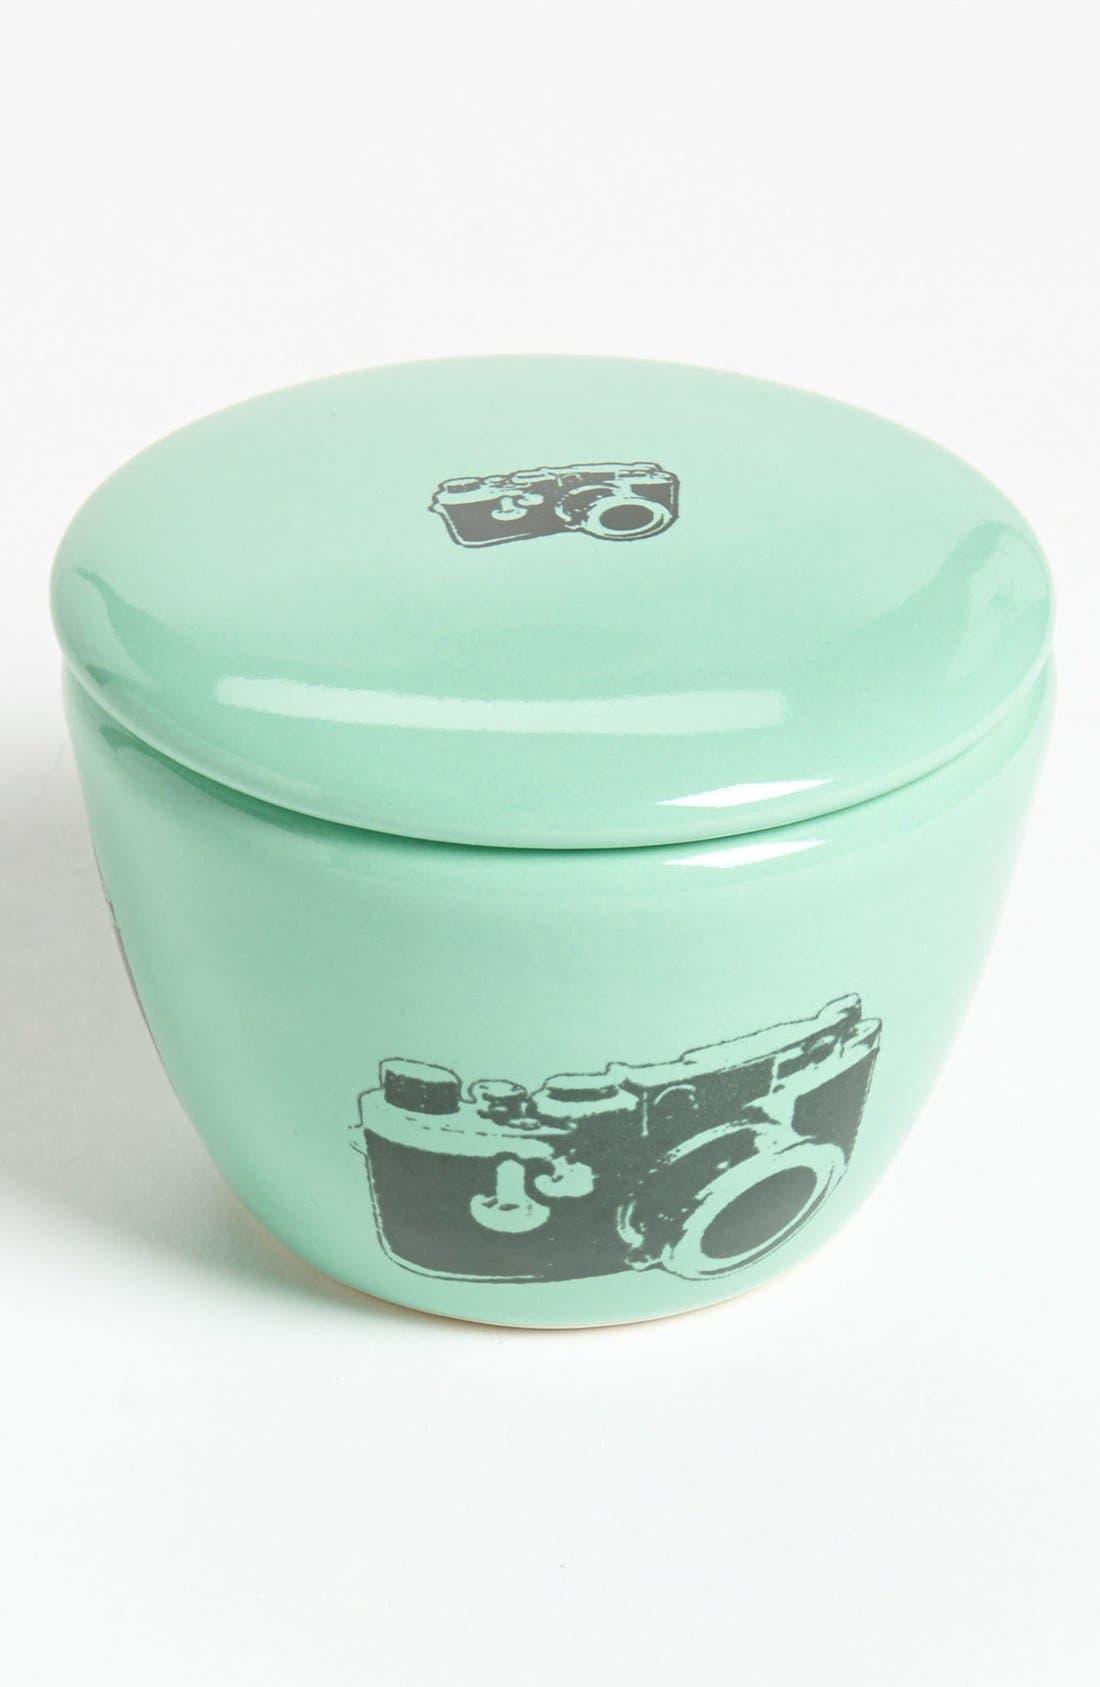 Main Image - CircaCeramics 'Camera' Lidded Bowl